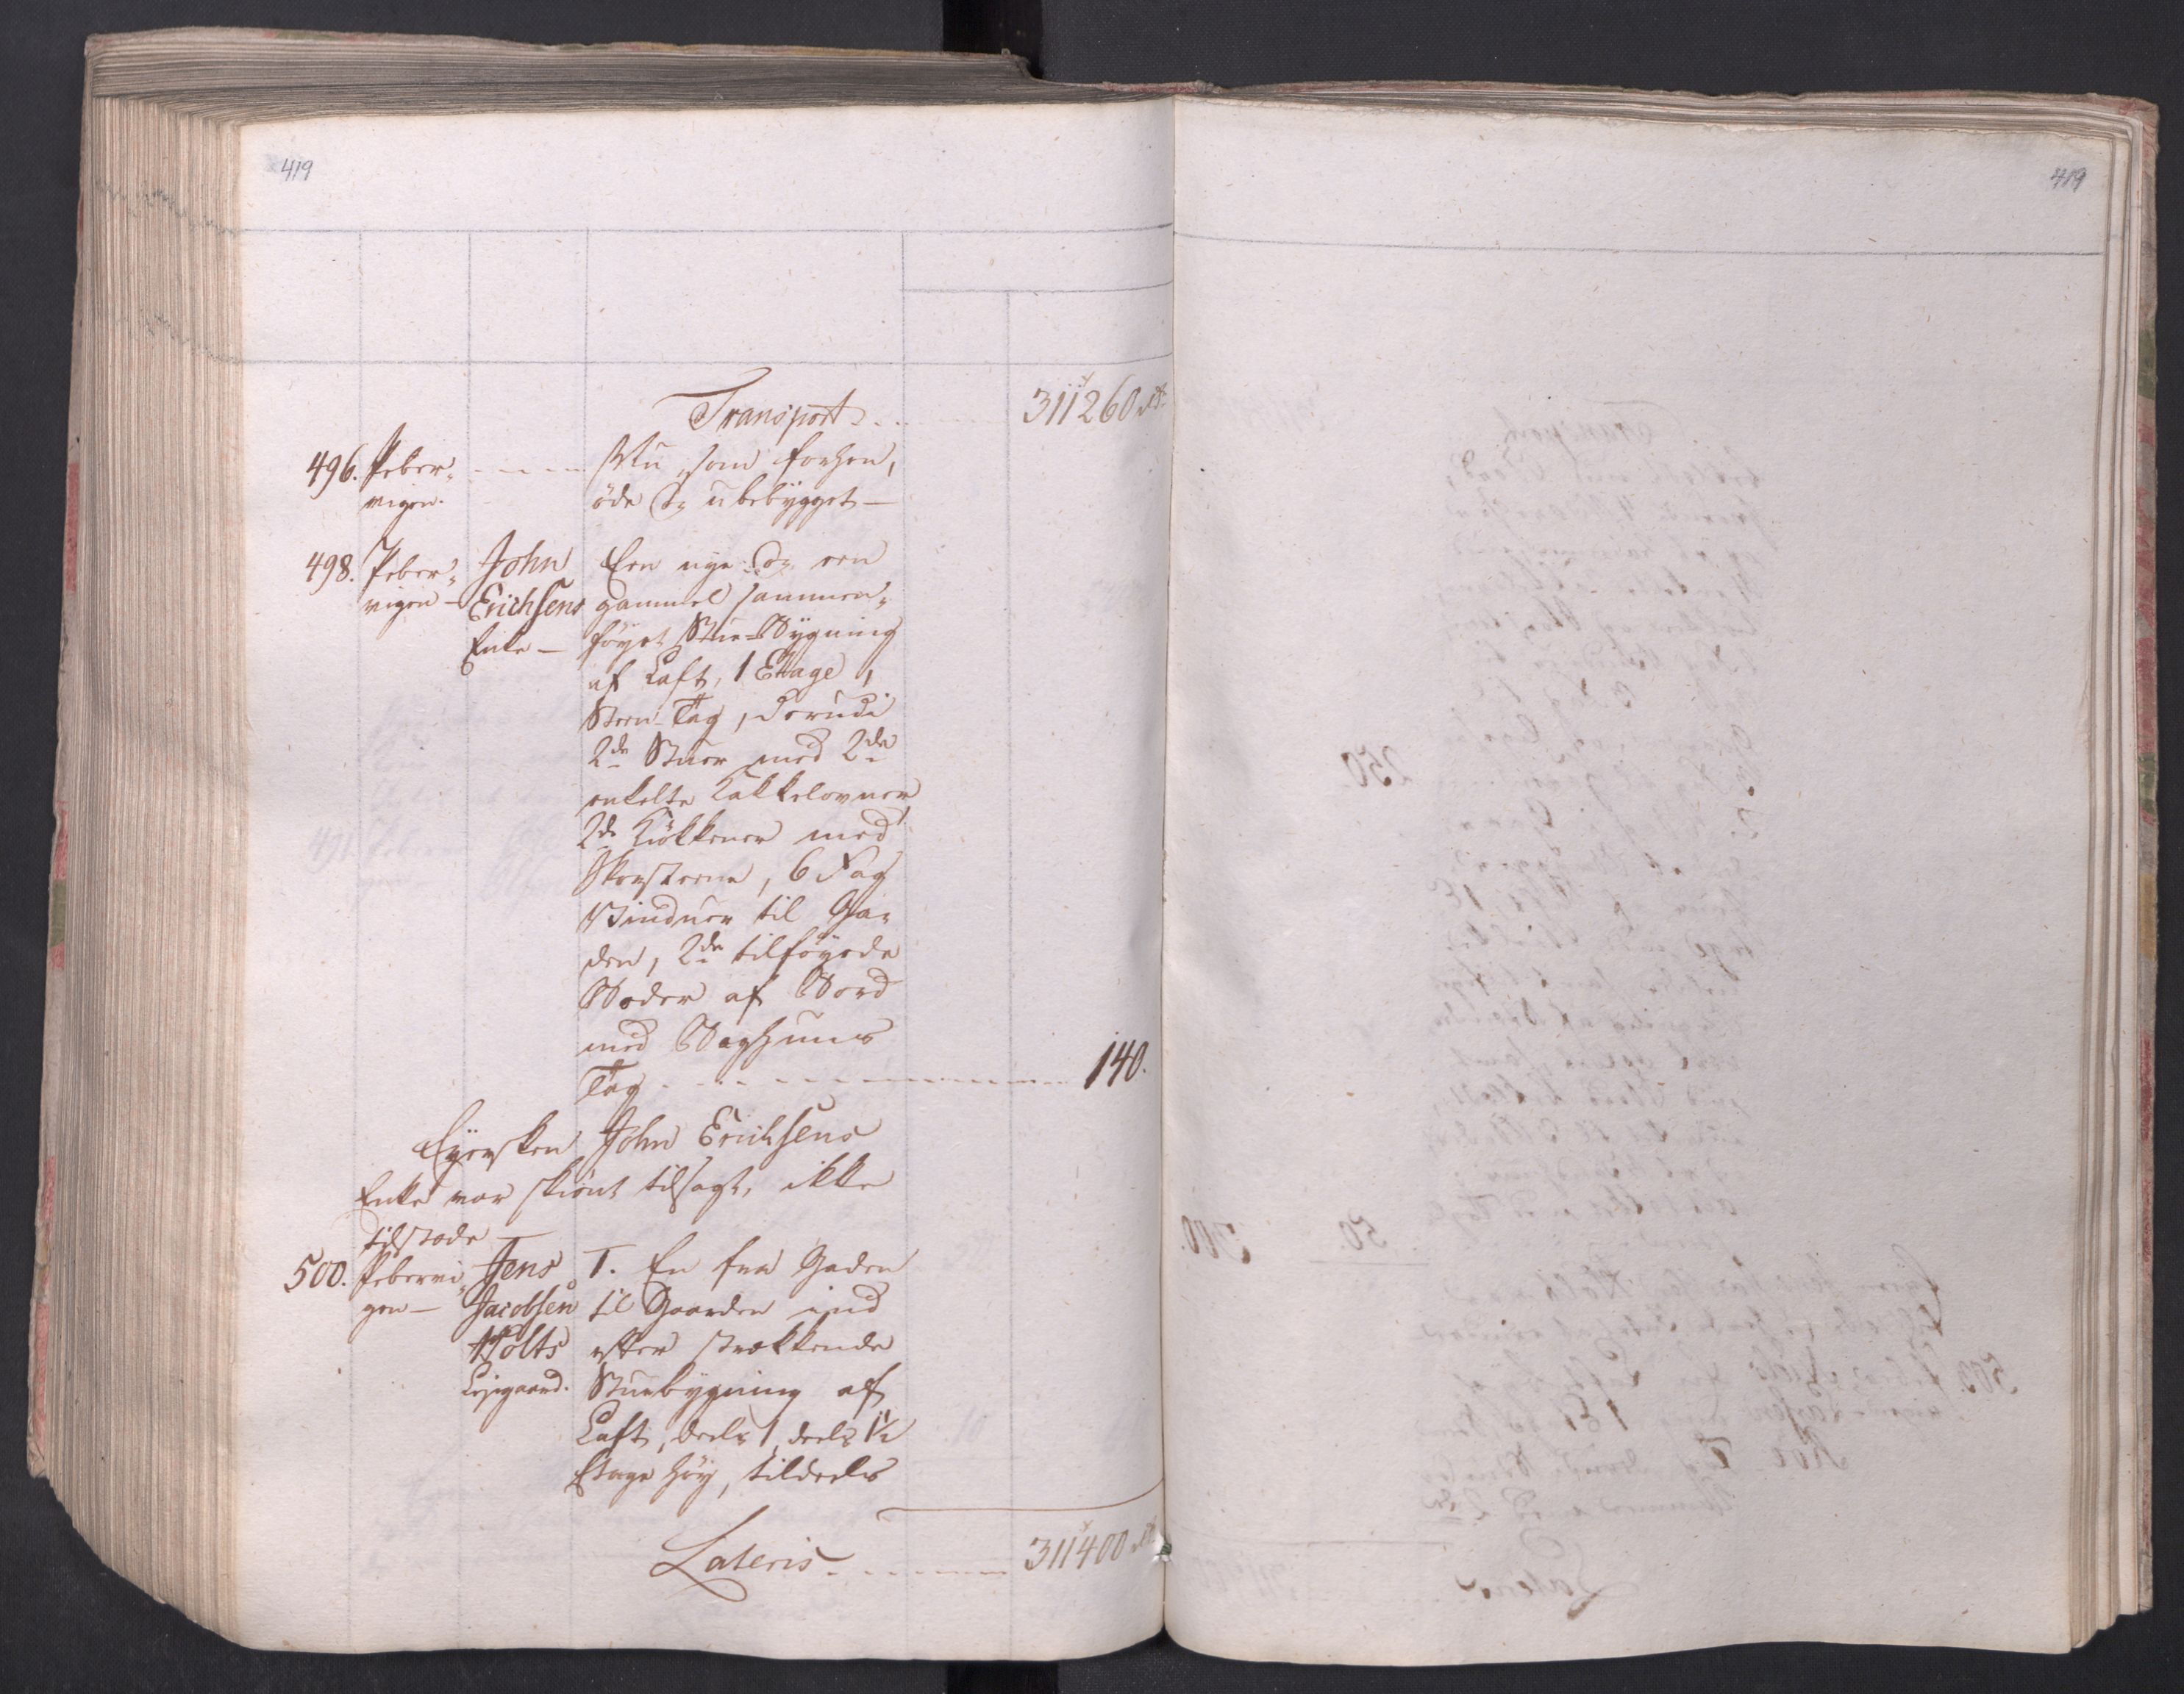 SAO, Kristiania stiftamt, I/Ia/L0015: Branntakster, 1797, s. 419